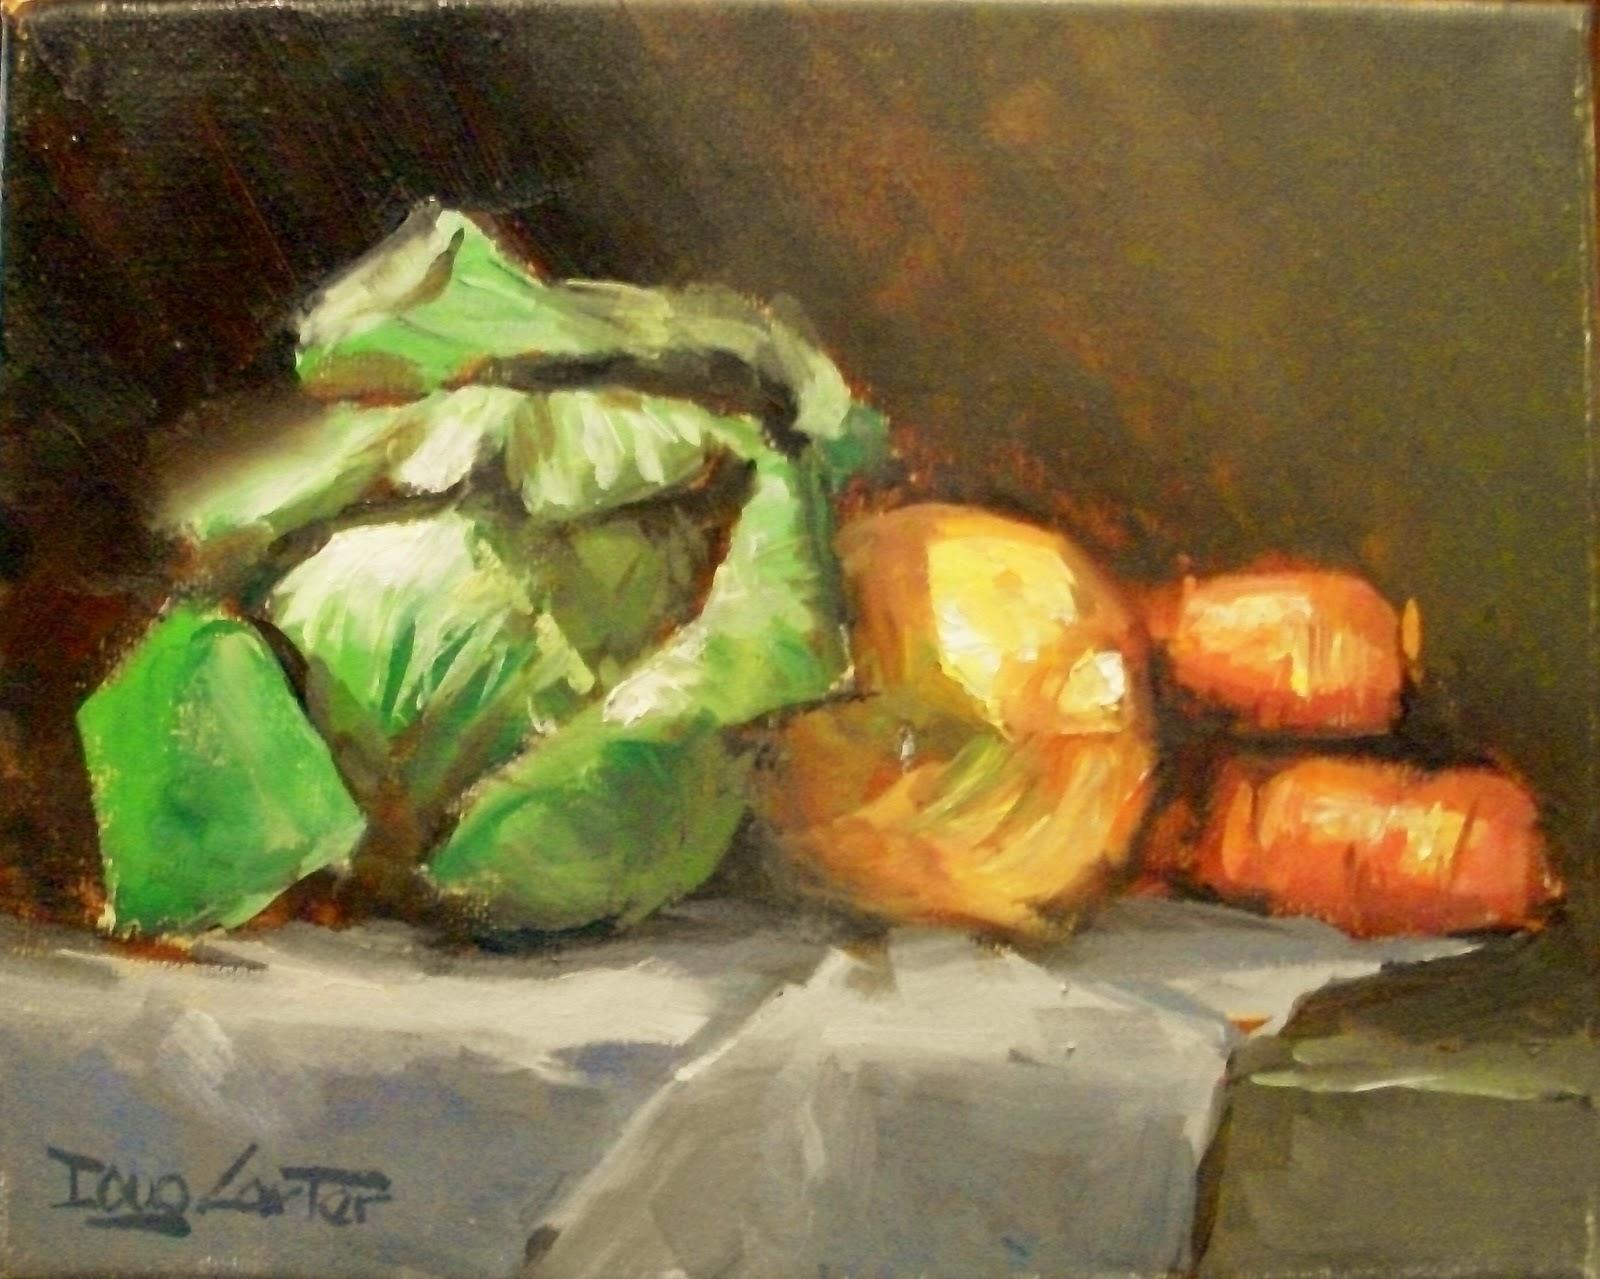 """COLE SLAW"" original fine art by Doug Carter"